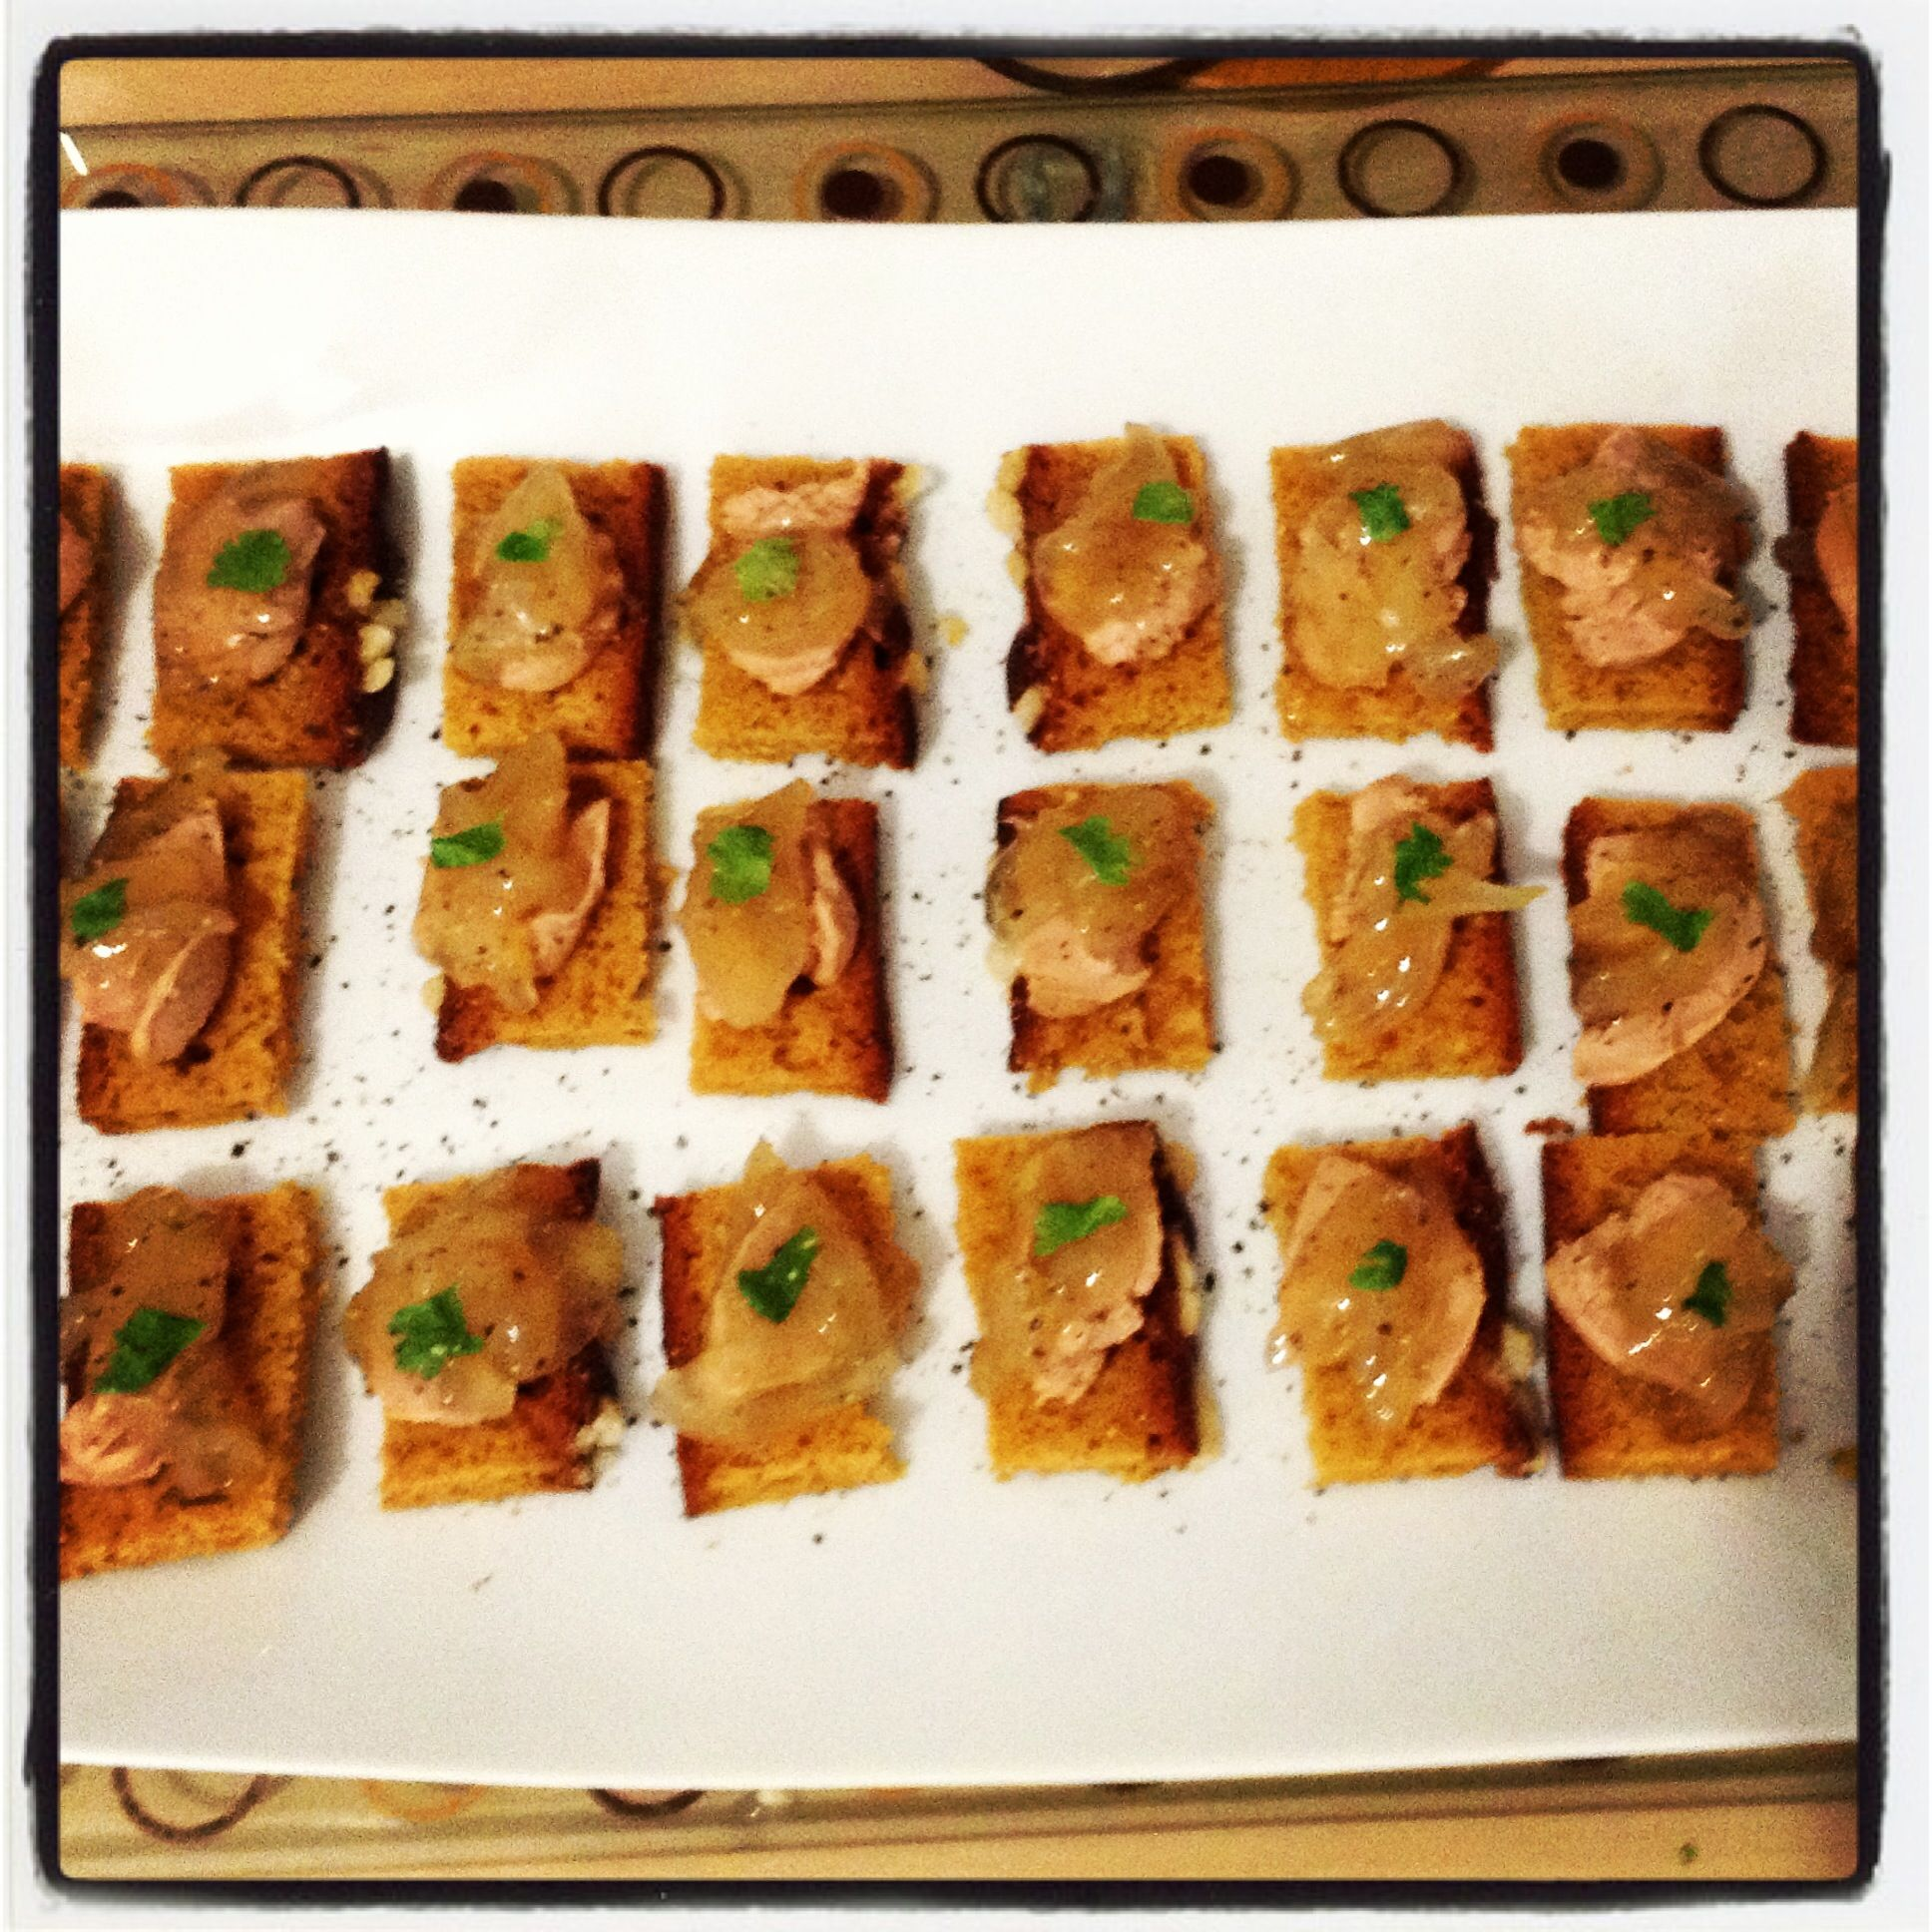 Christmastoast oignonjam | foie gras | spiced cake